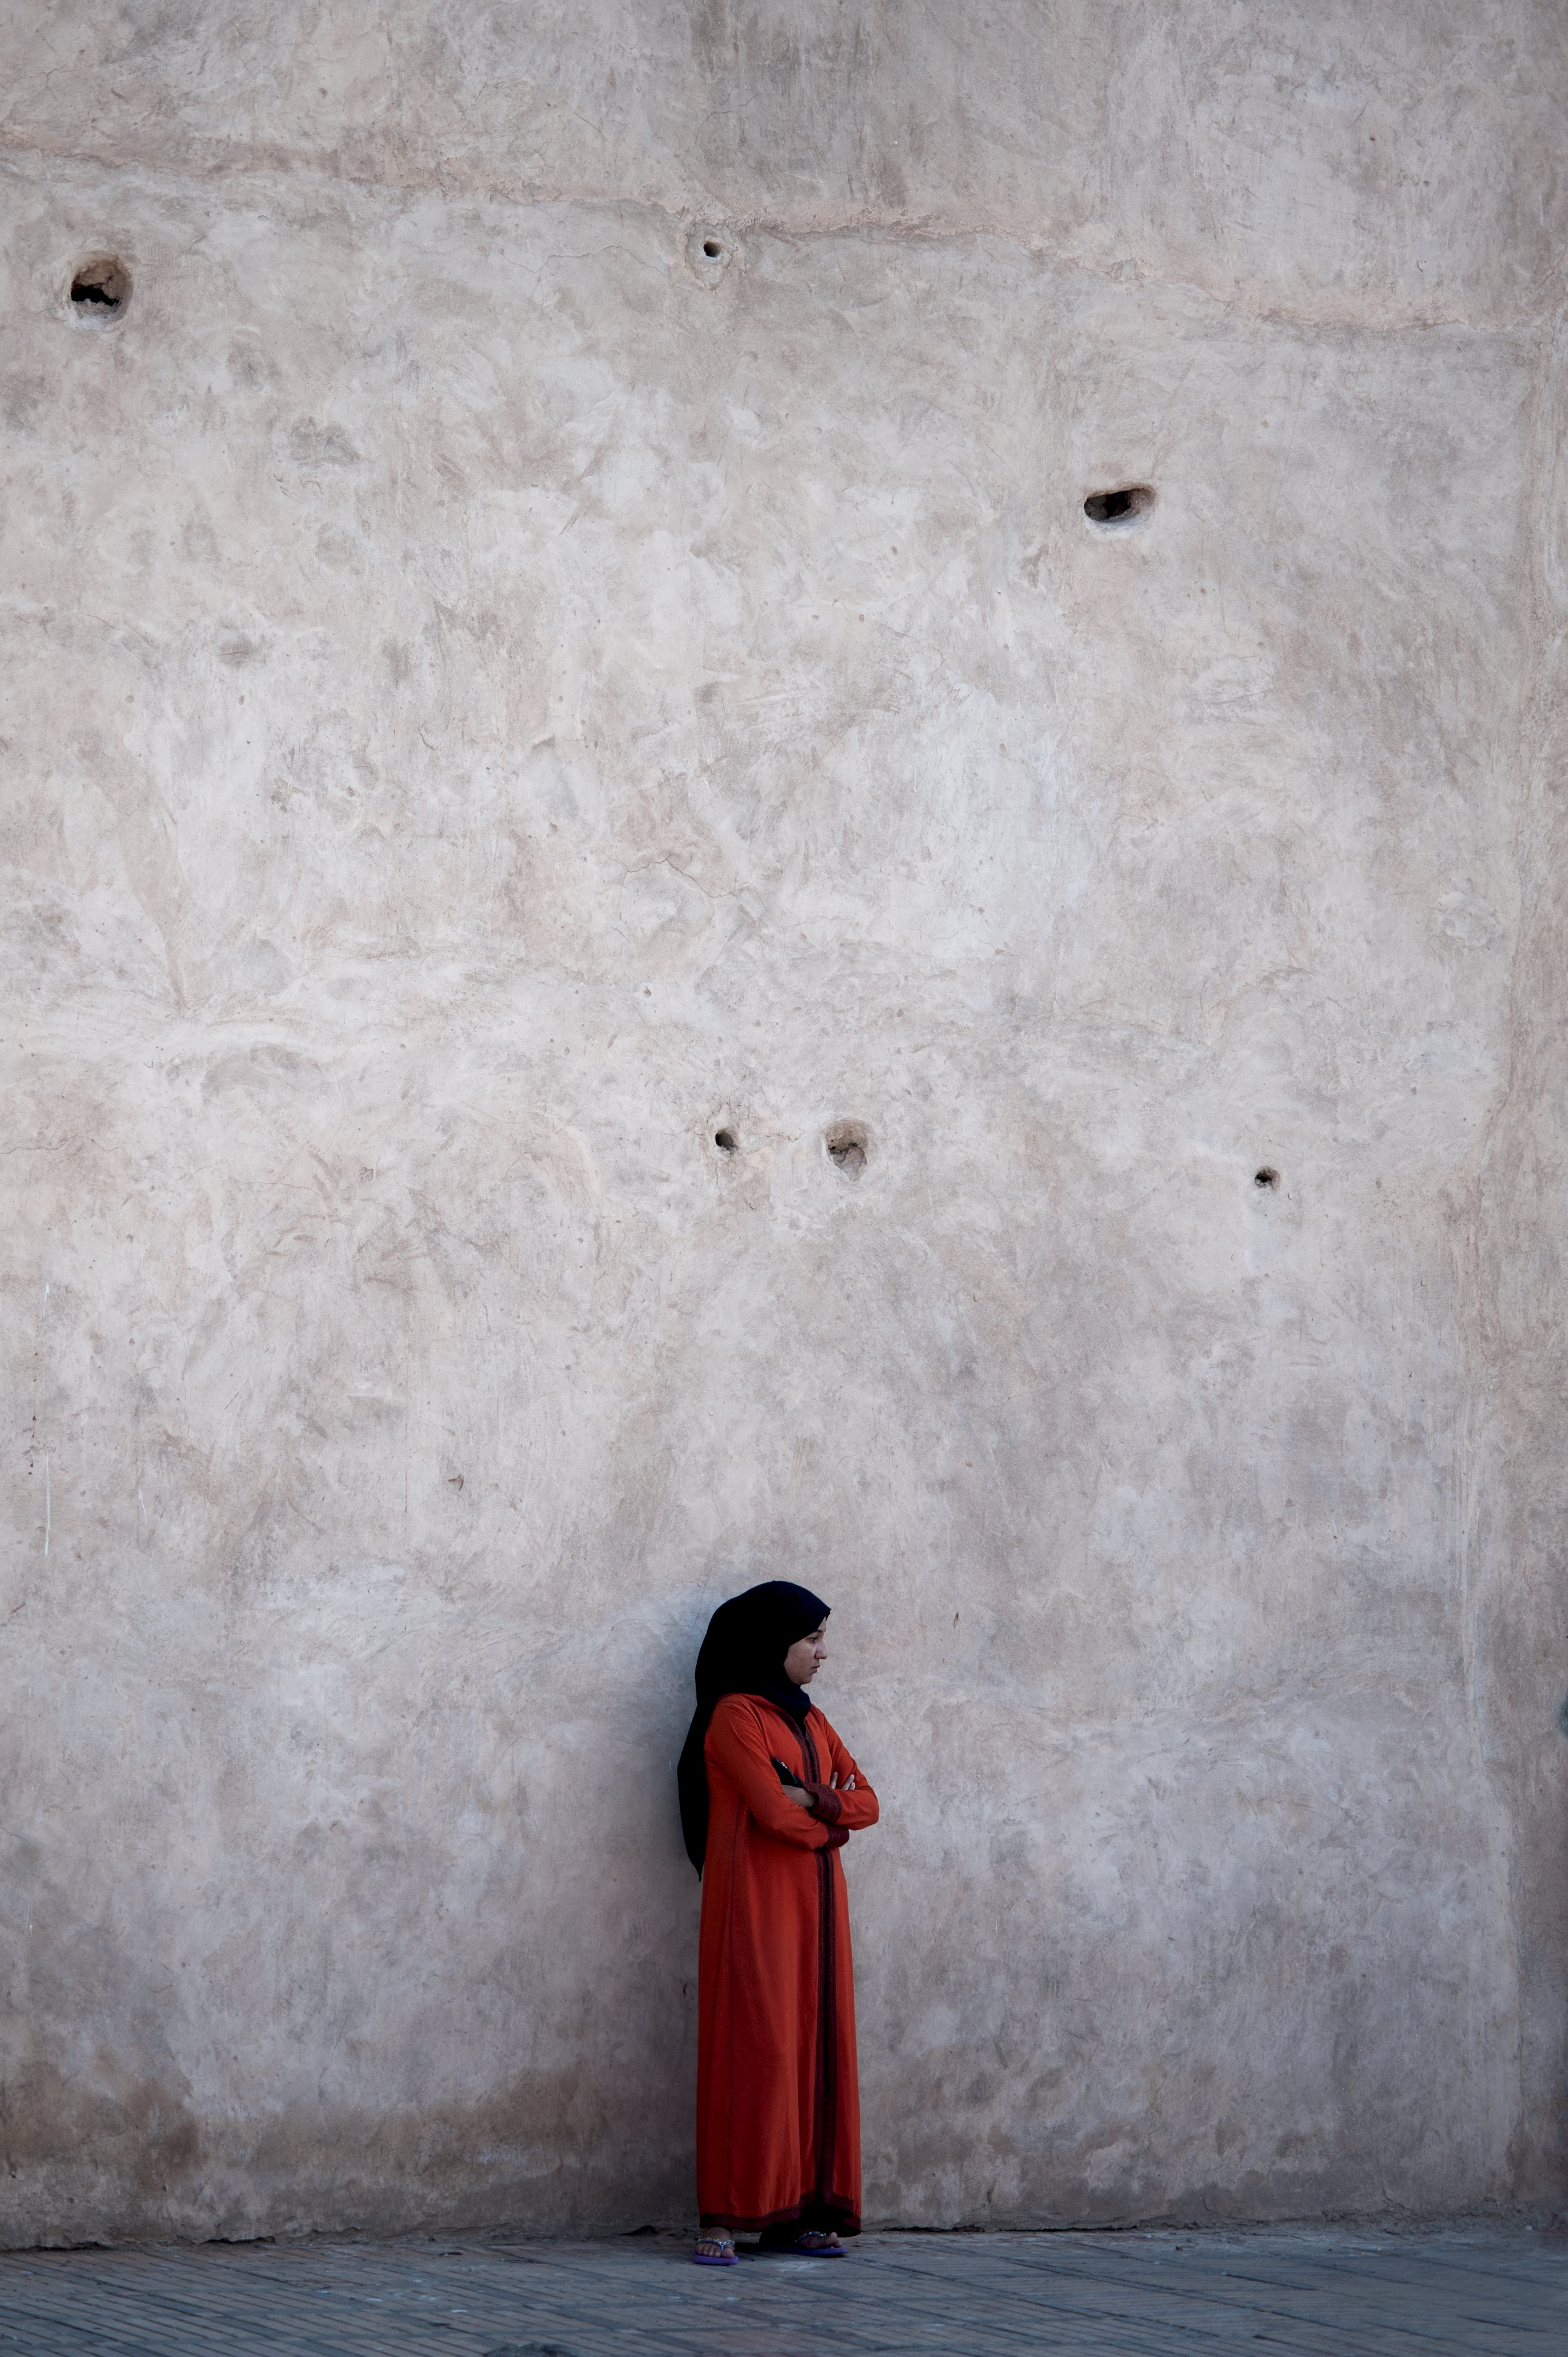 Muslim woman in red